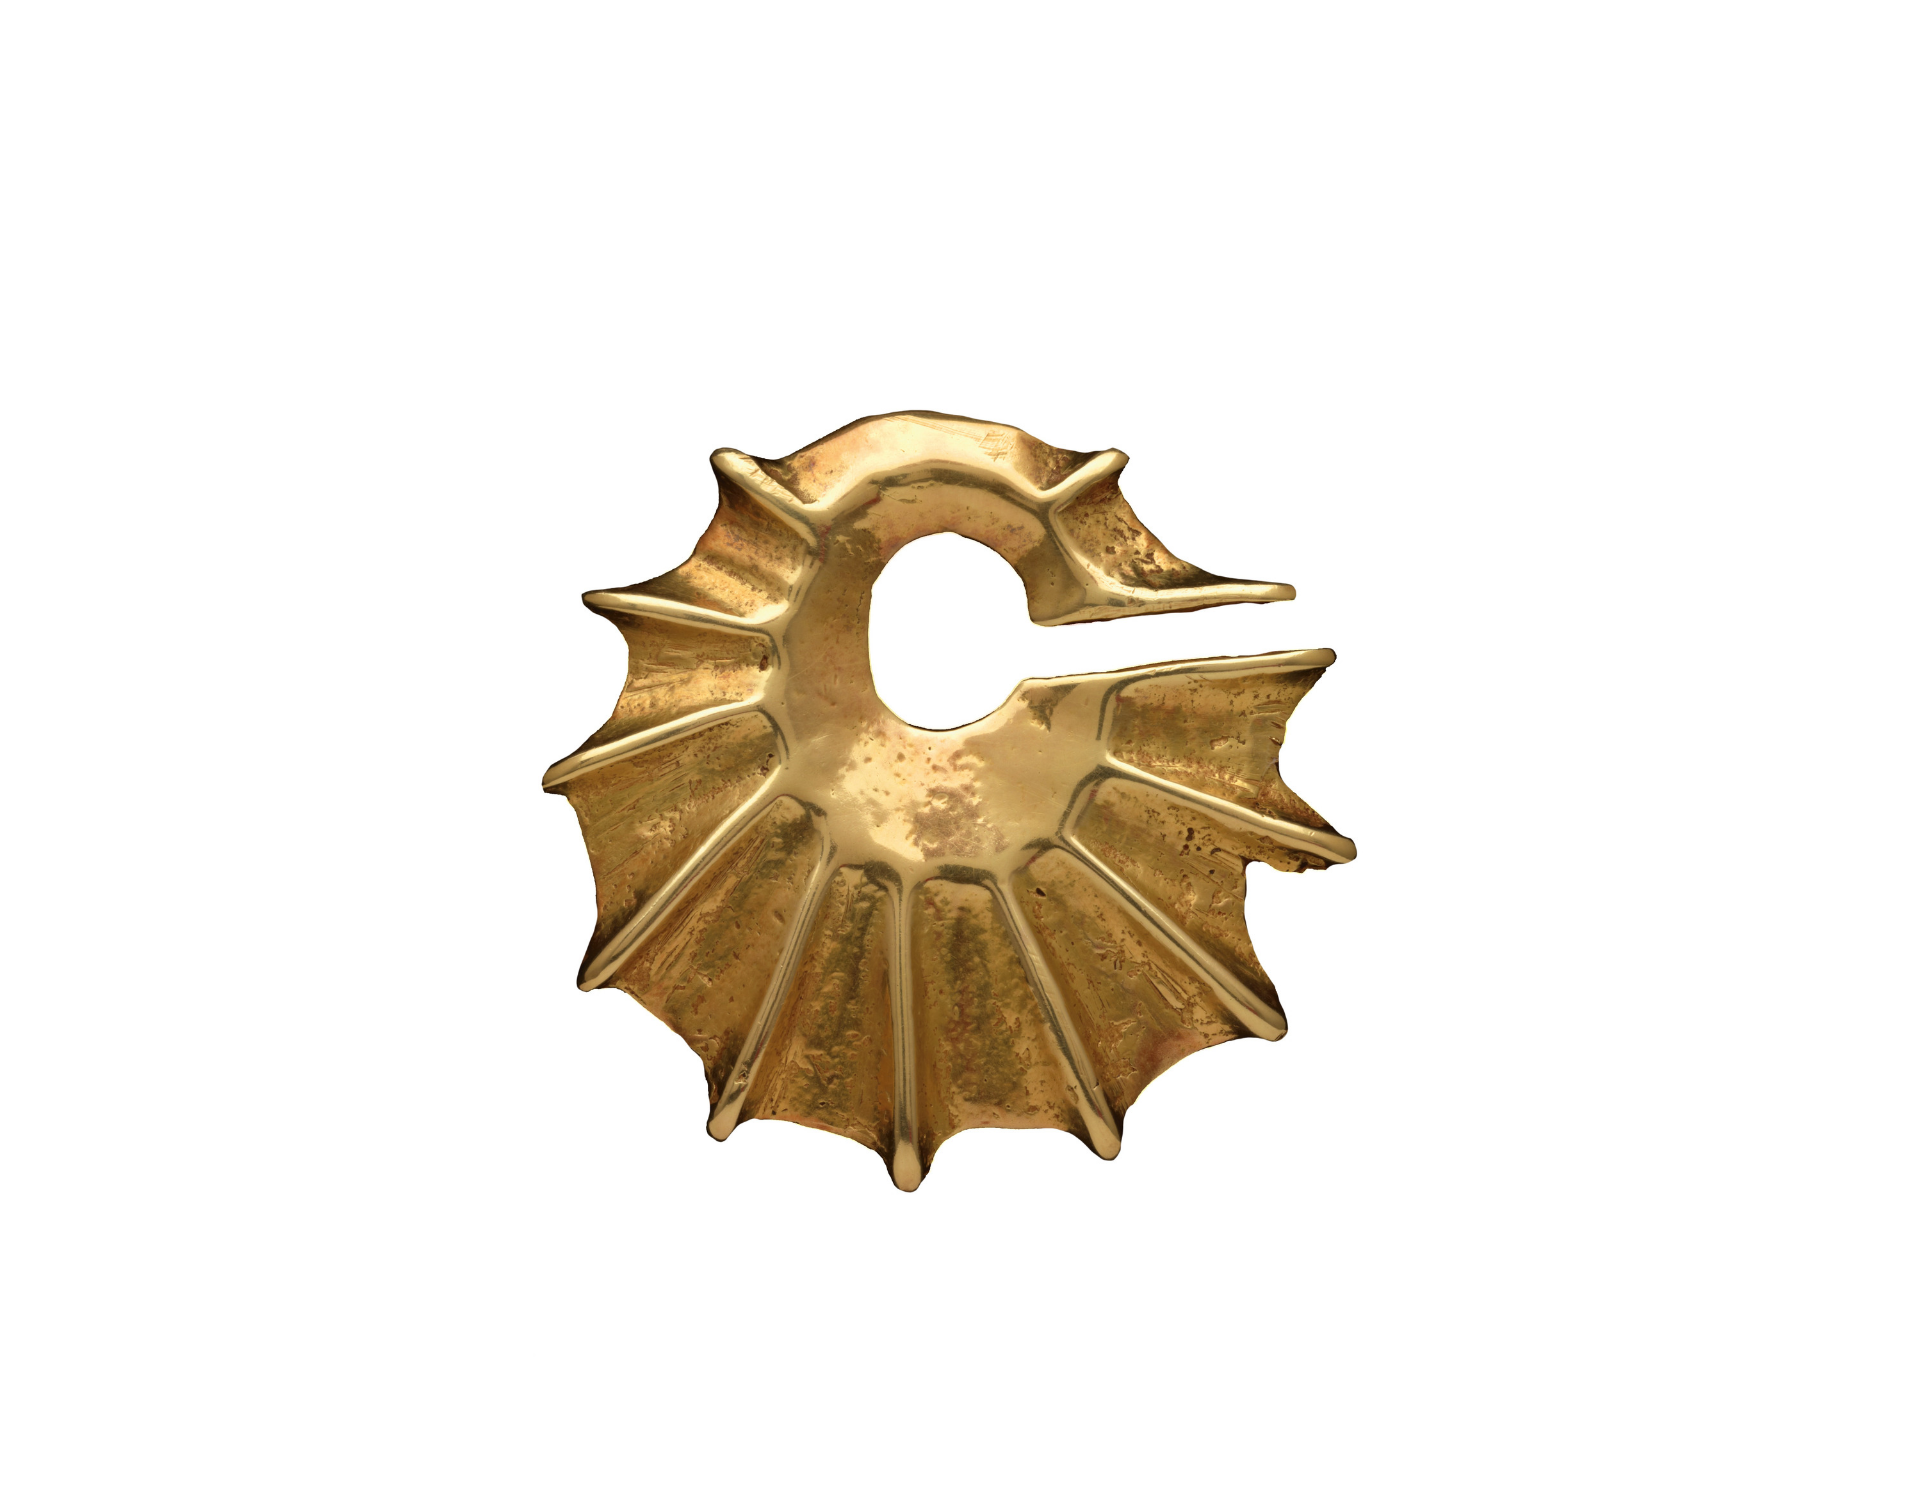 Ceremonial pendant  ( mendaka ) Indonesia, Lesser Sunda Islands, West Sumba, Lamboya, Bogar Kahale 19th century or earlier (possibly 14th to 16th century) Gold Alloy | 2 1/2 (diameter) x 1/4 (6.4 x 0.6 cm) © Dallas Museum of Art | Texas, USA